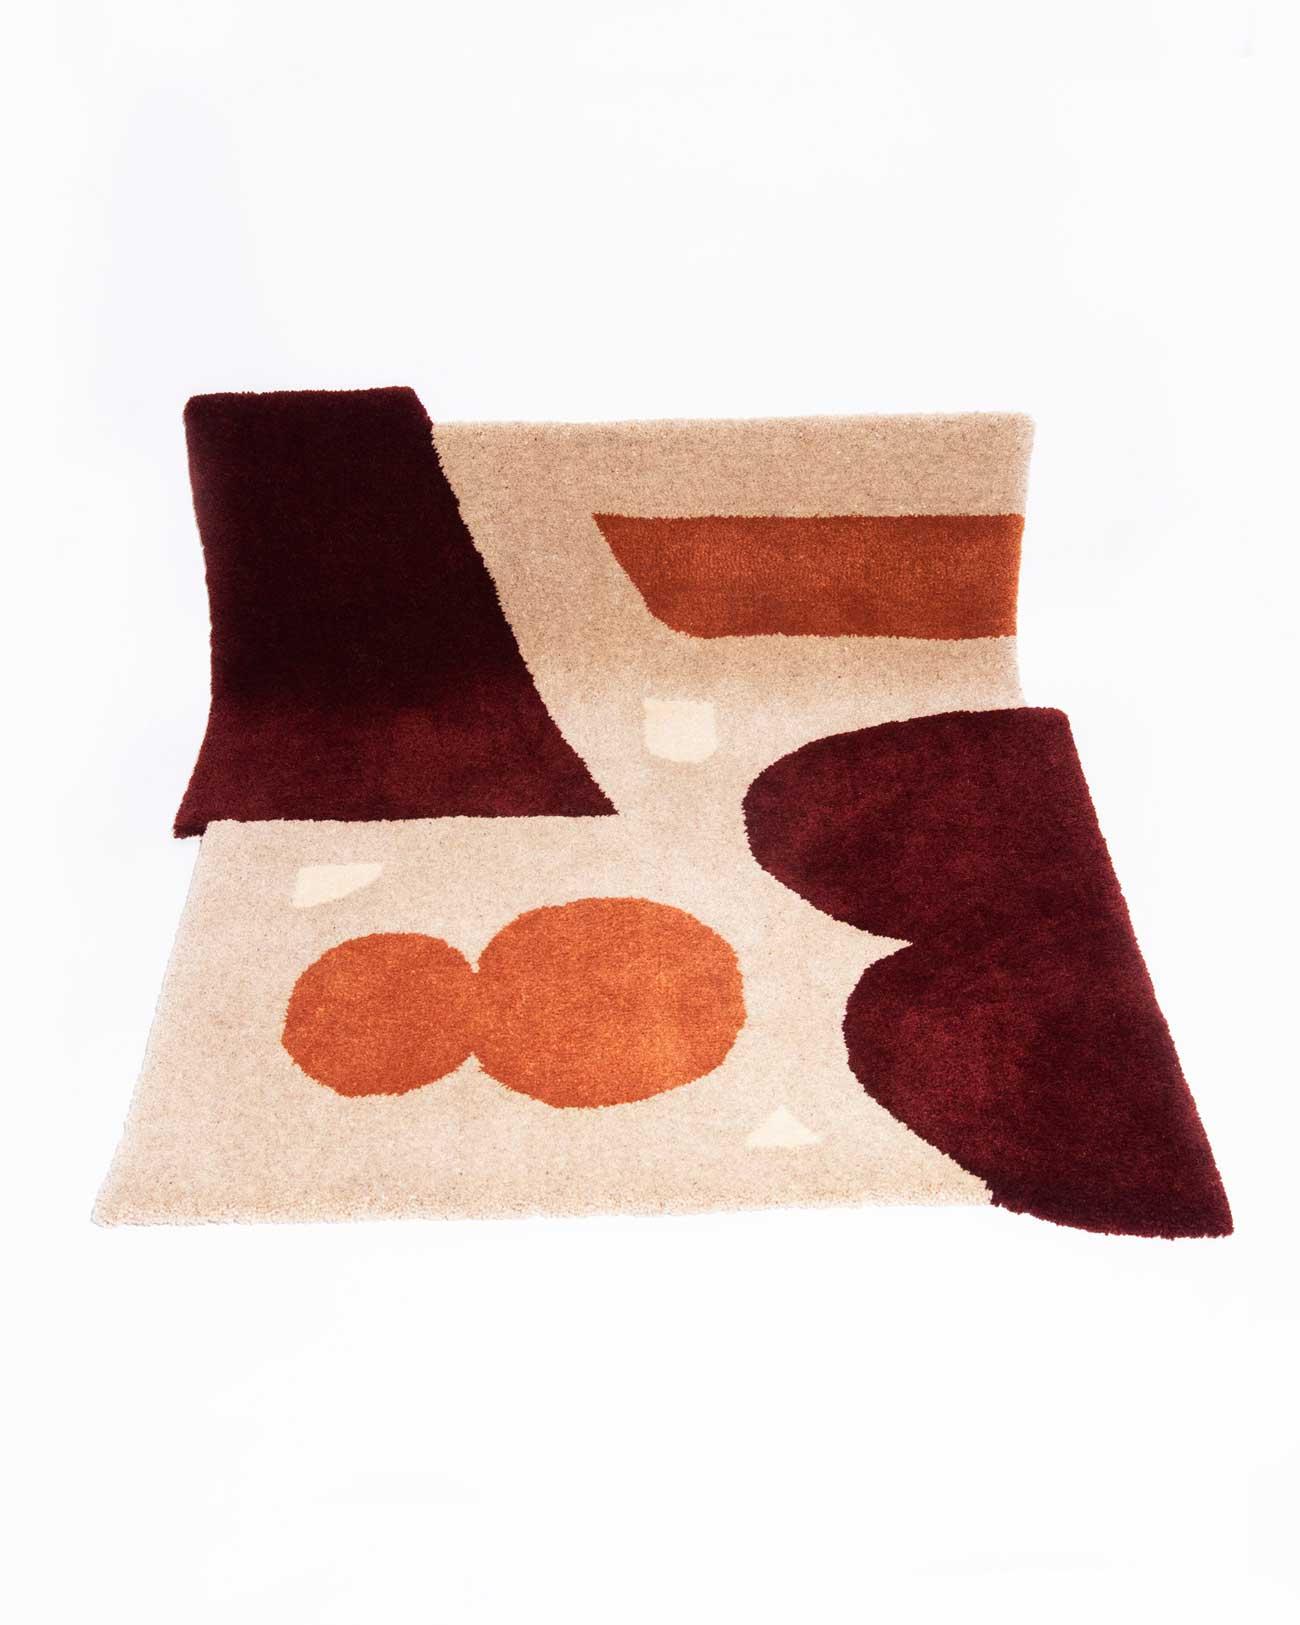 studio mirte van kooten hand tufted dawn rug 04